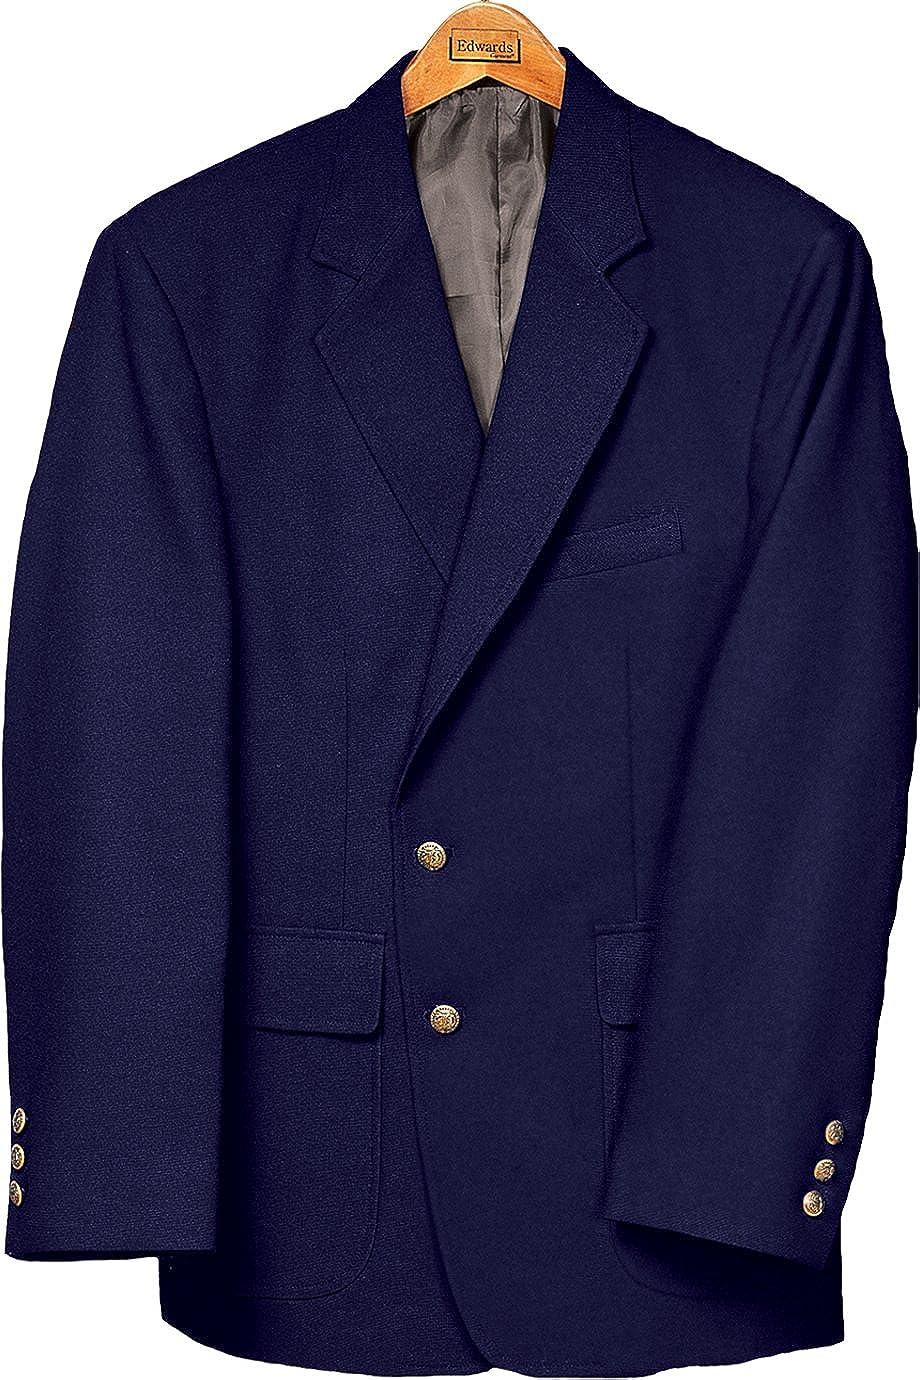 Edwards Men's Value Poly Blazer, Navy, 50